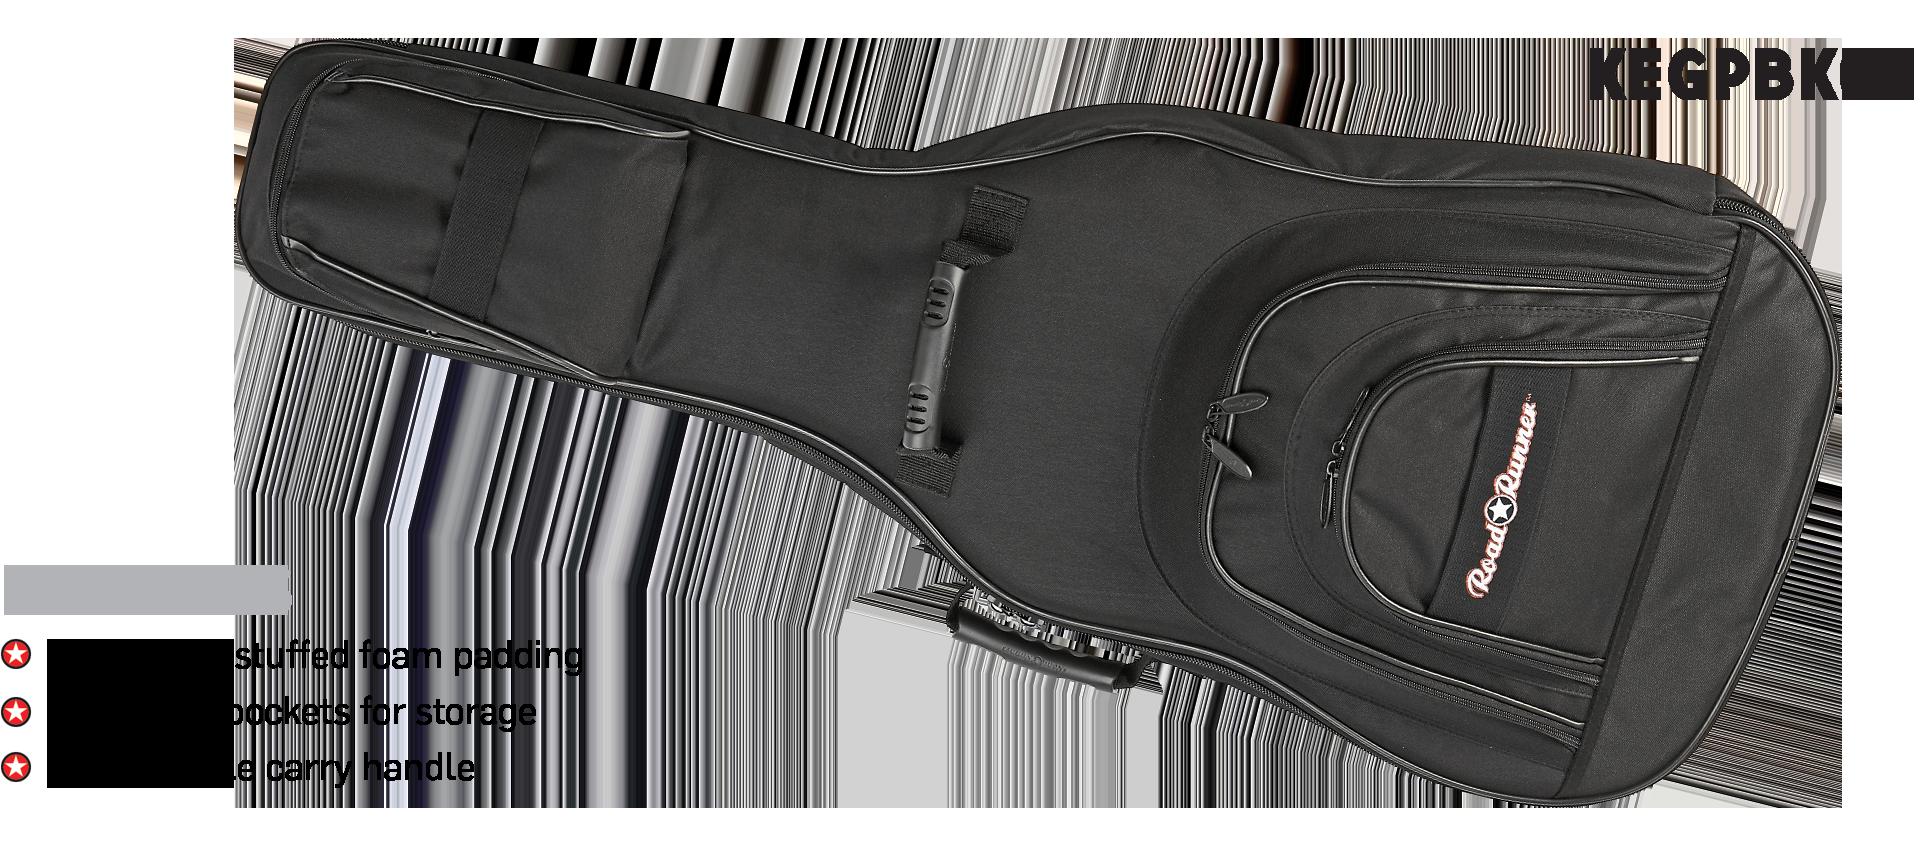 Roadster Electric Guitar Gig Bag Road Runner KEGPBK07